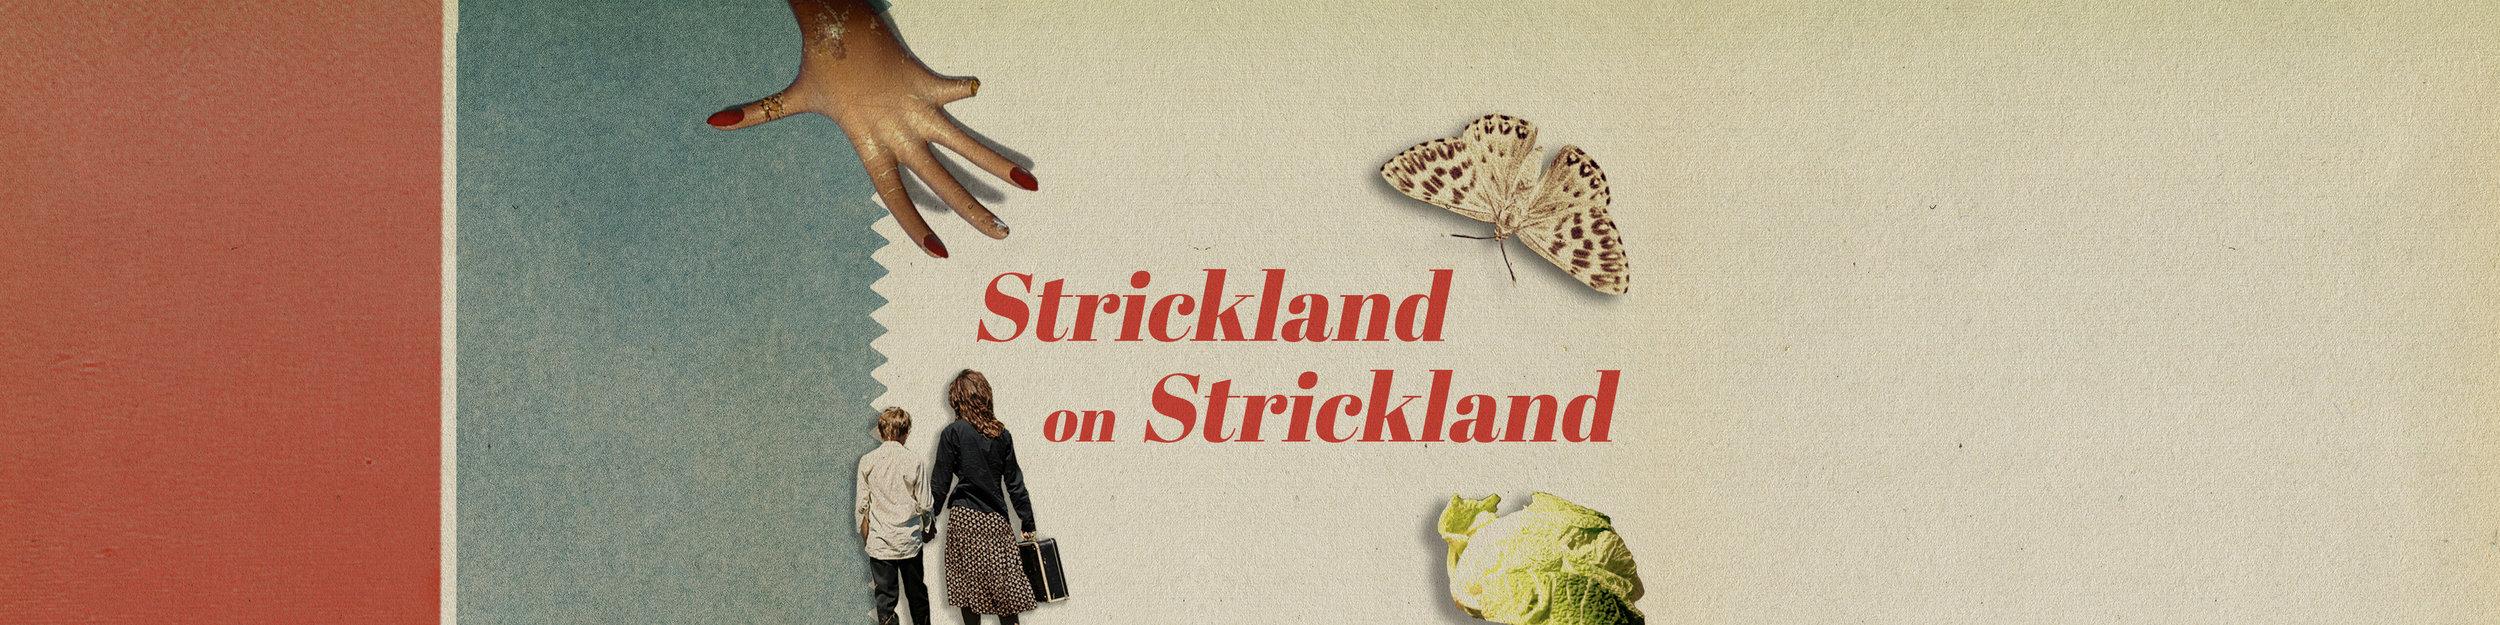 Stickland_itunes.jpg